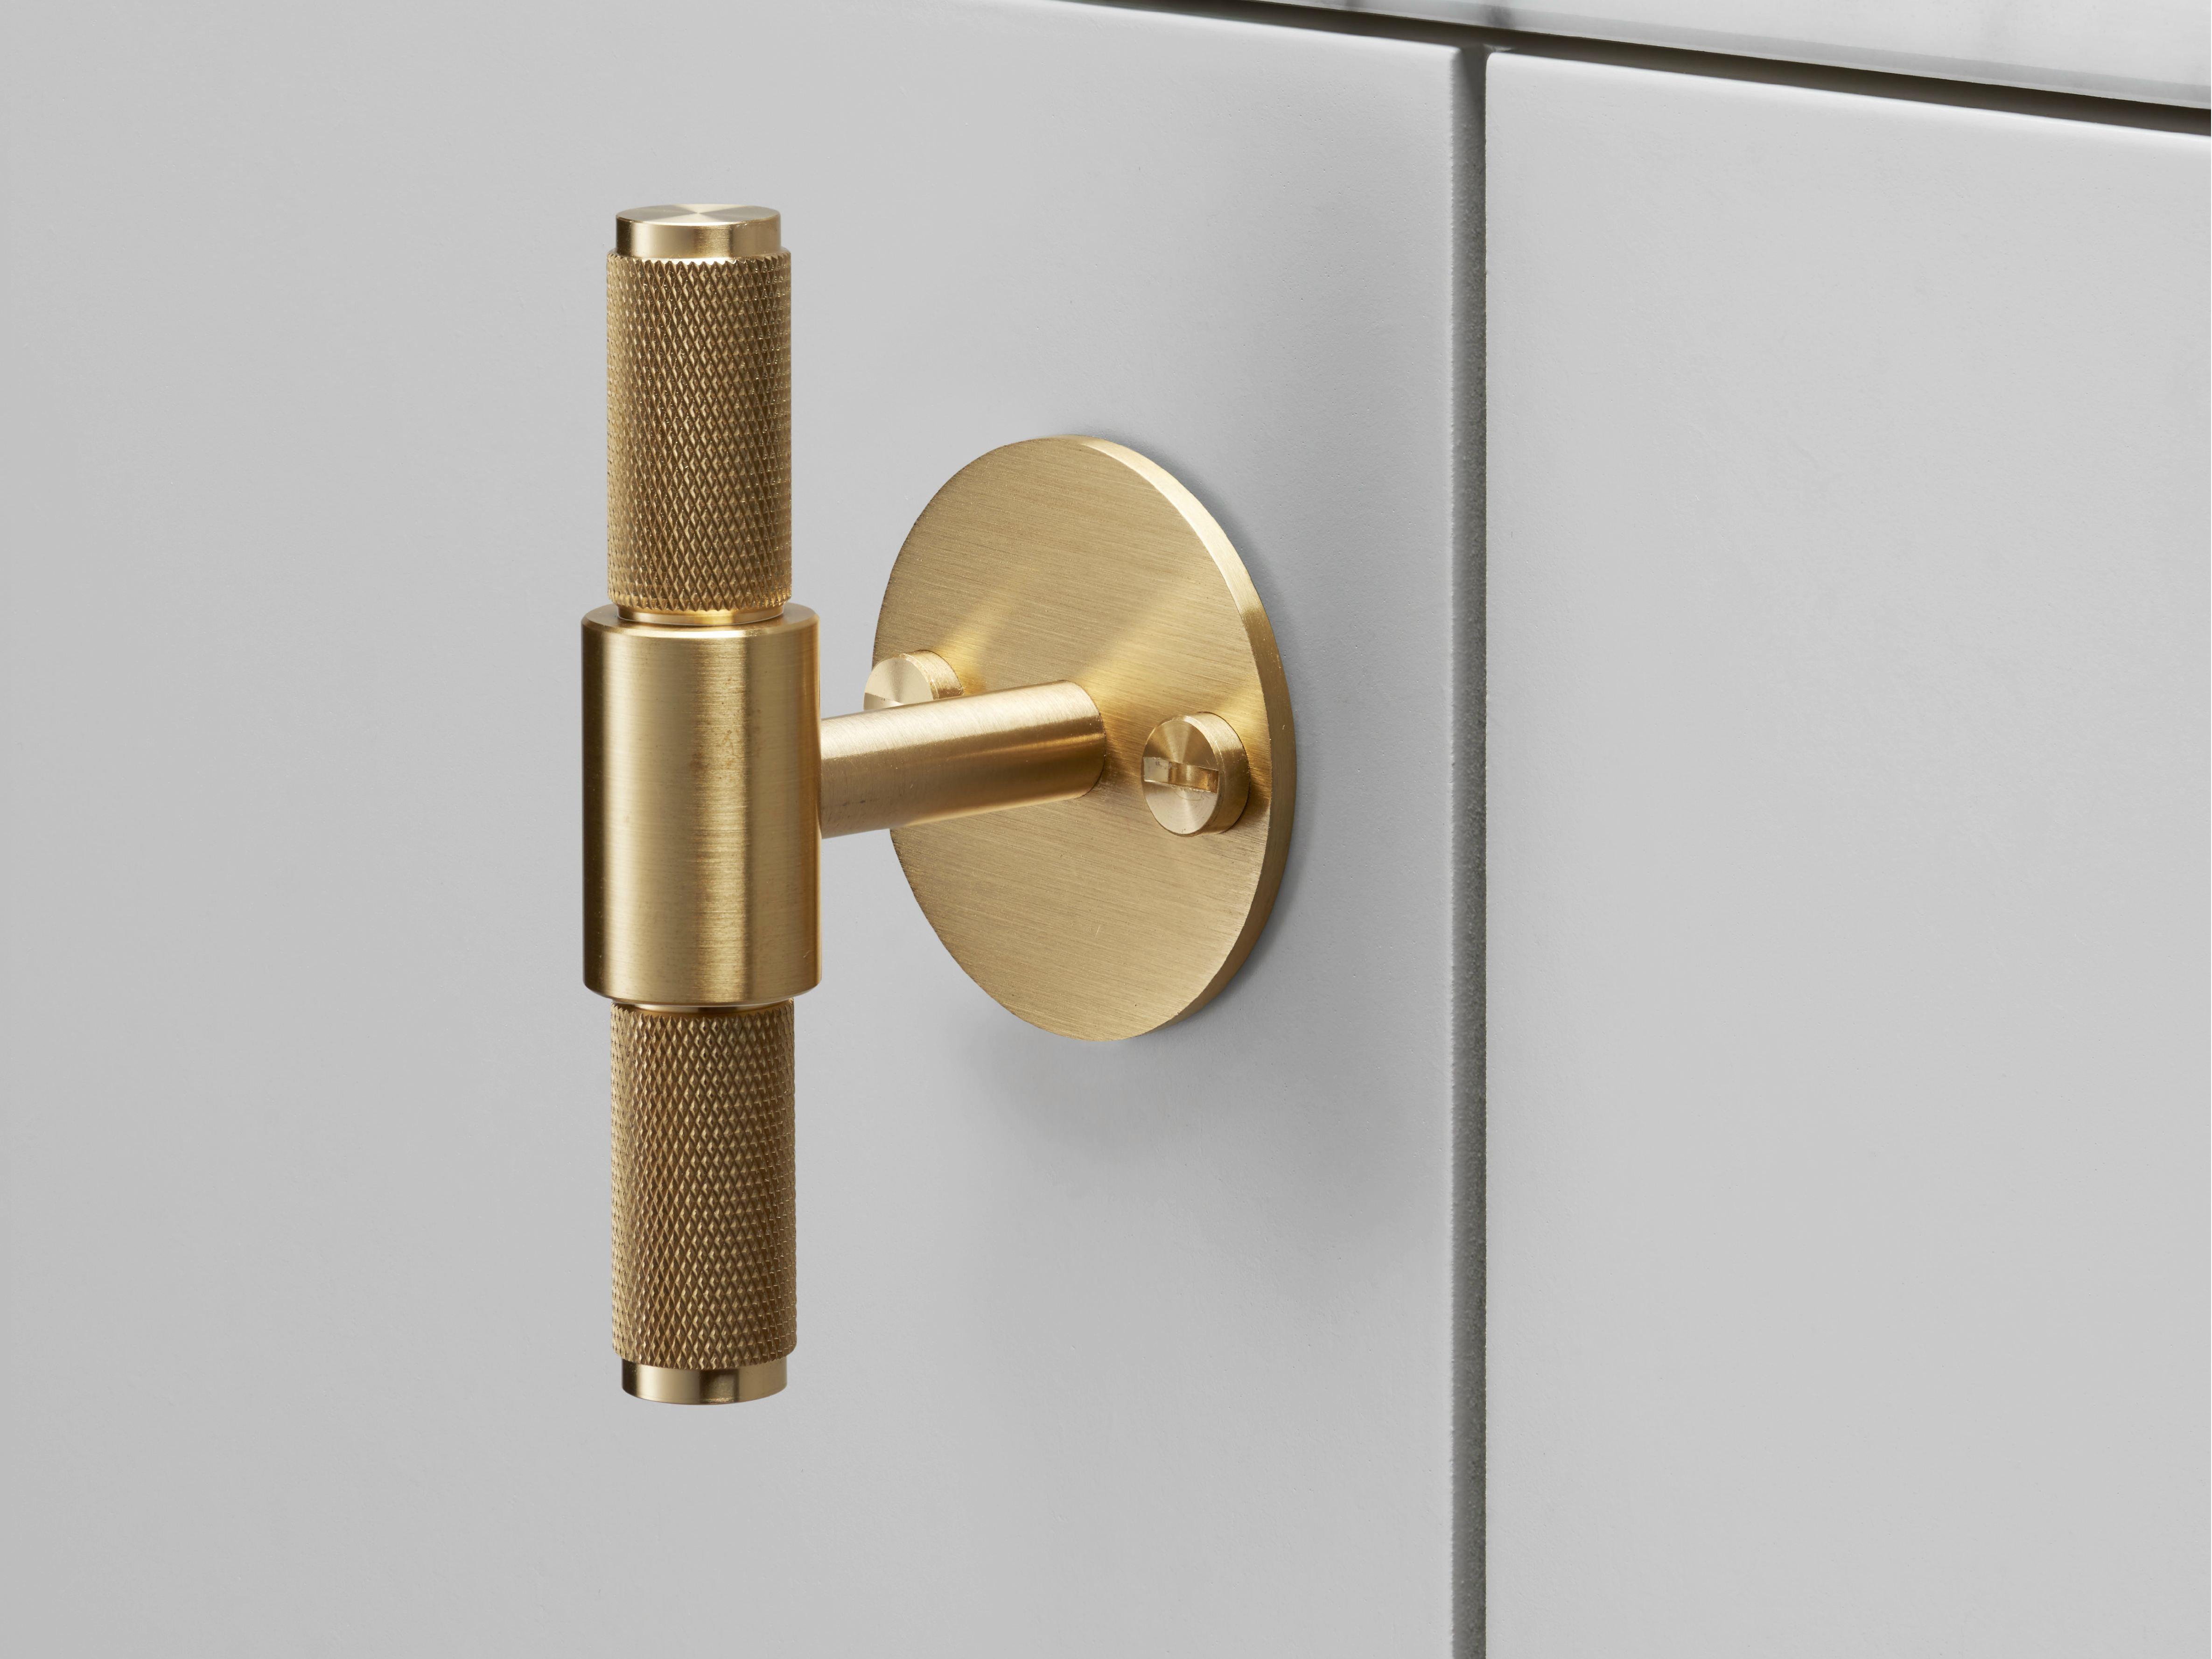 Metal Furniture Knob Get Hard Furniture Knob Buster Punch Details Doors Pinterest